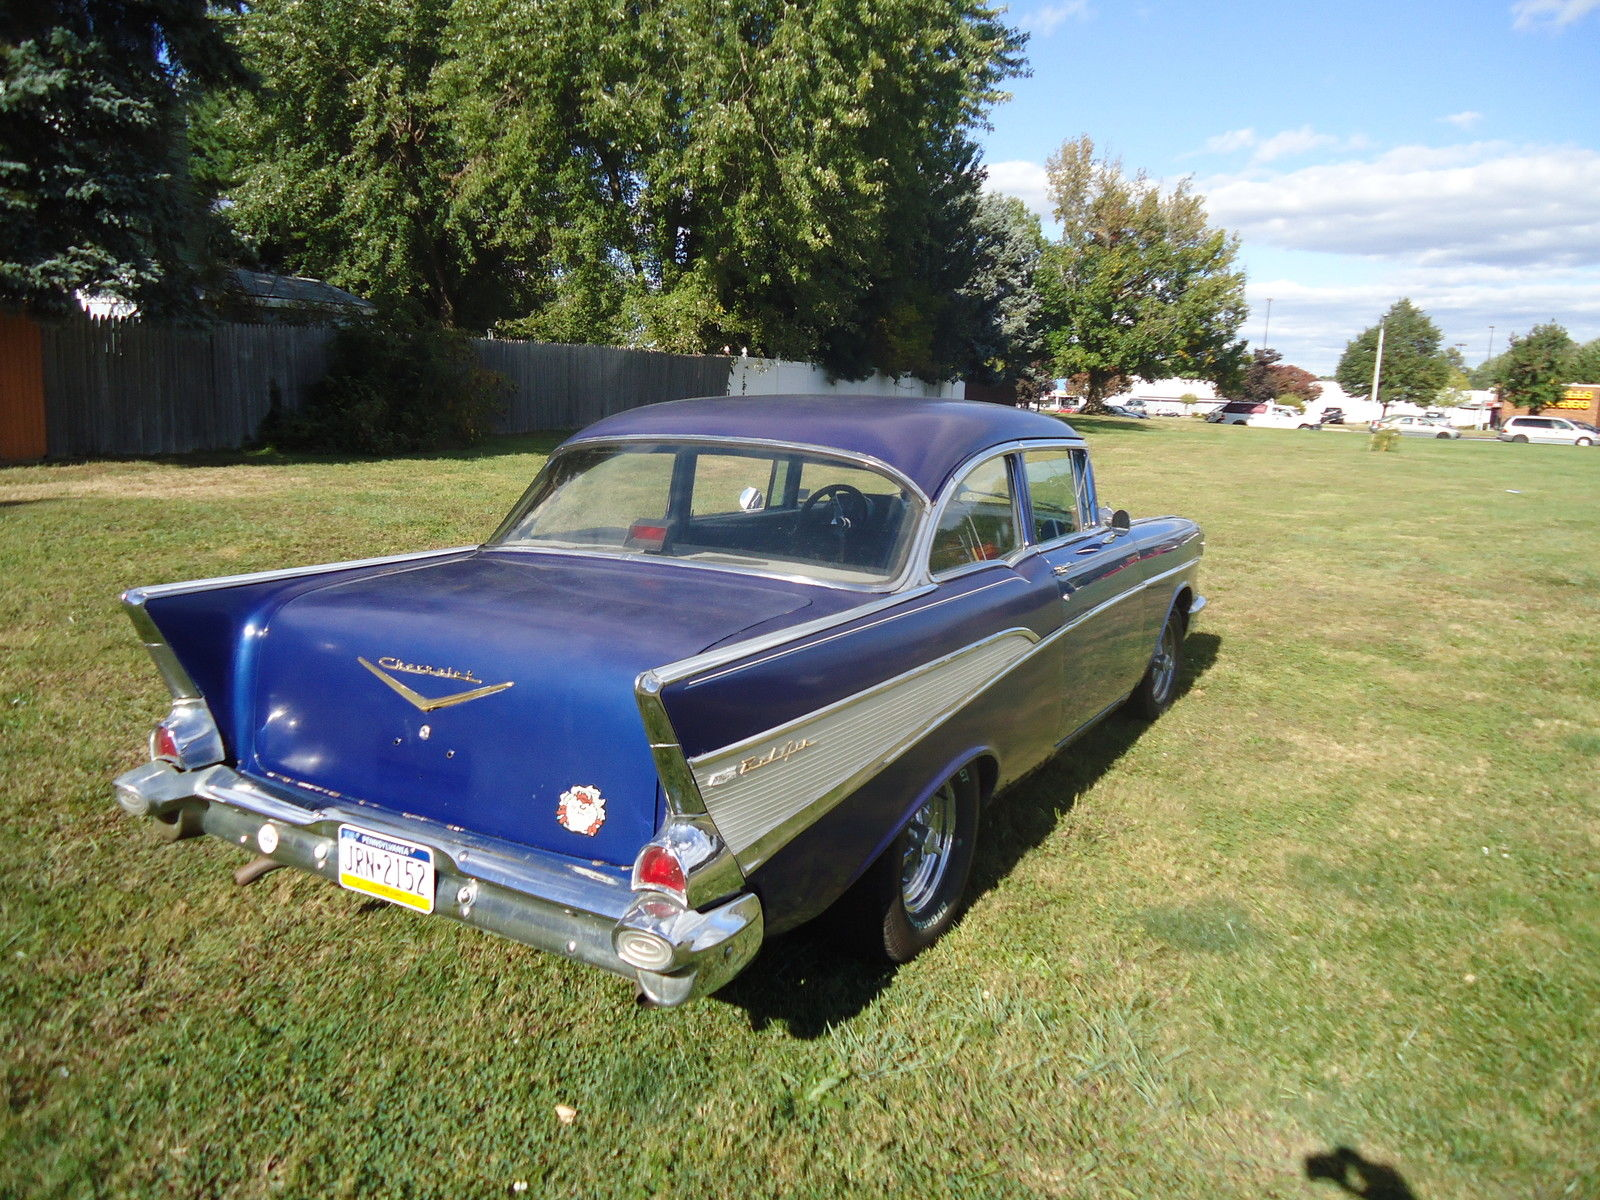 1957 Chevrolet Bel Air 2 Door Post Coupe Chevy Driver Rat Hot Rod Sedan Prevnext